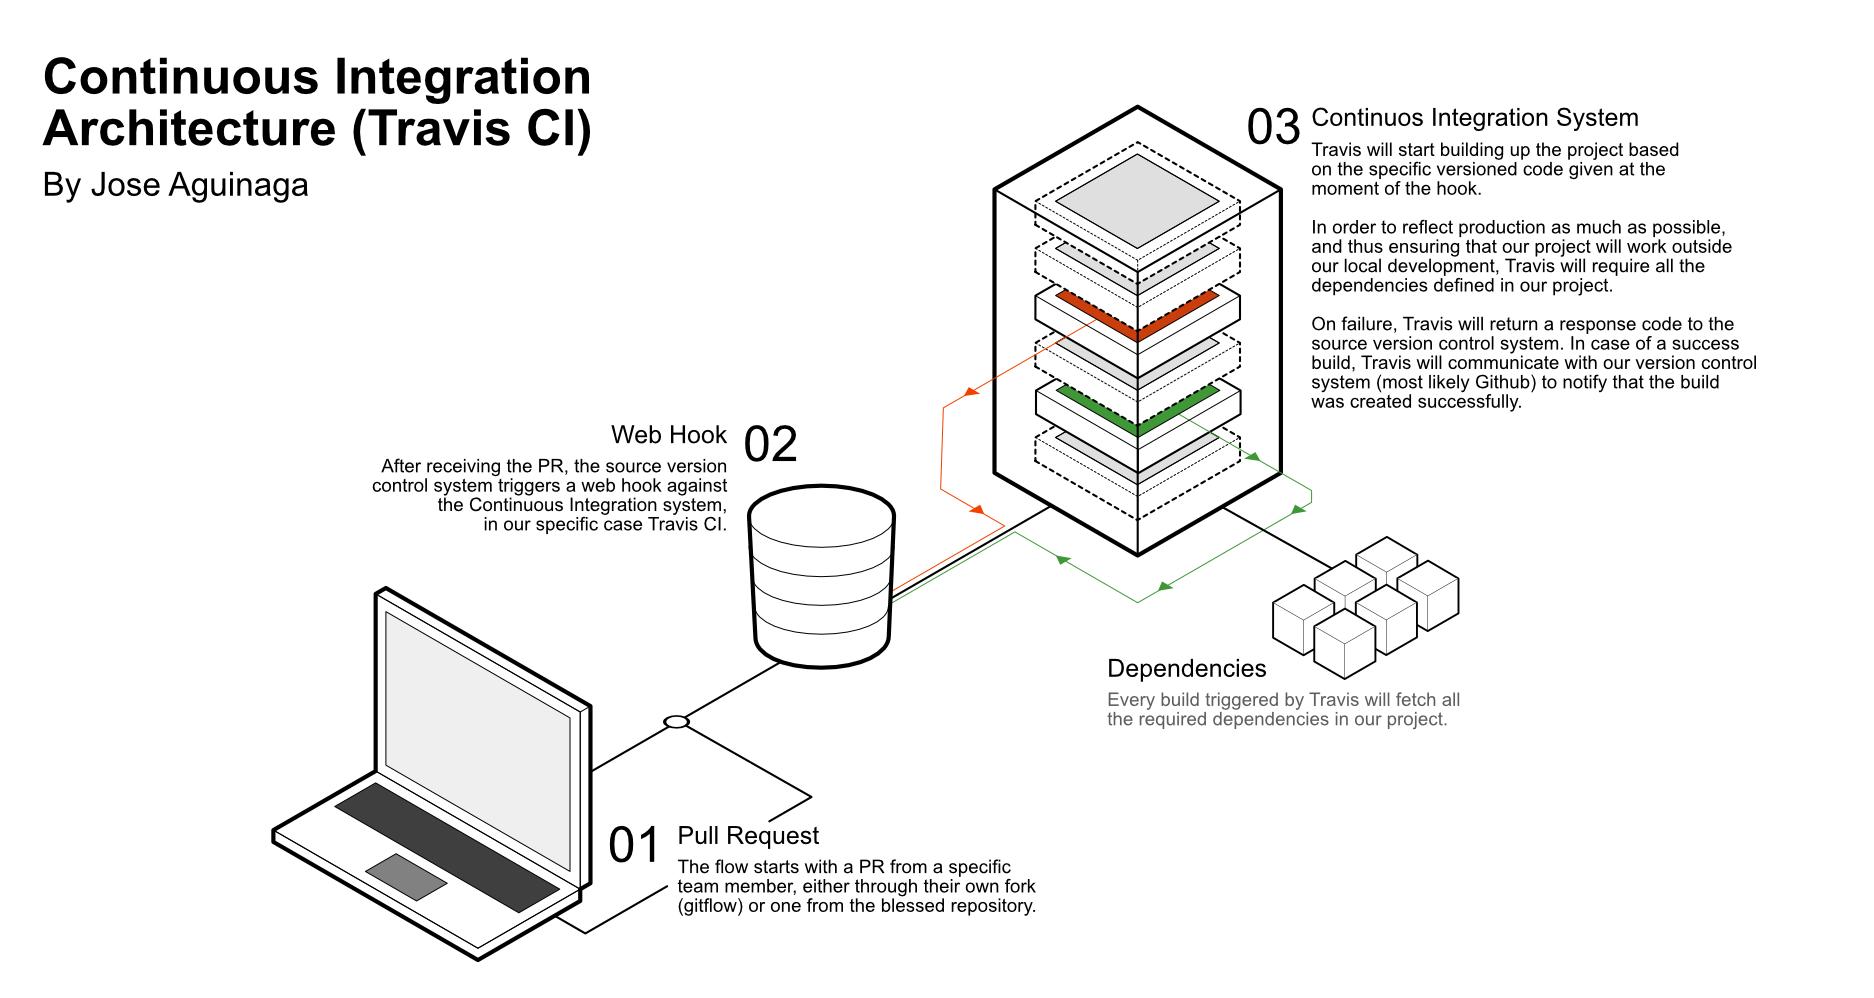 Continuous Integration Diagram